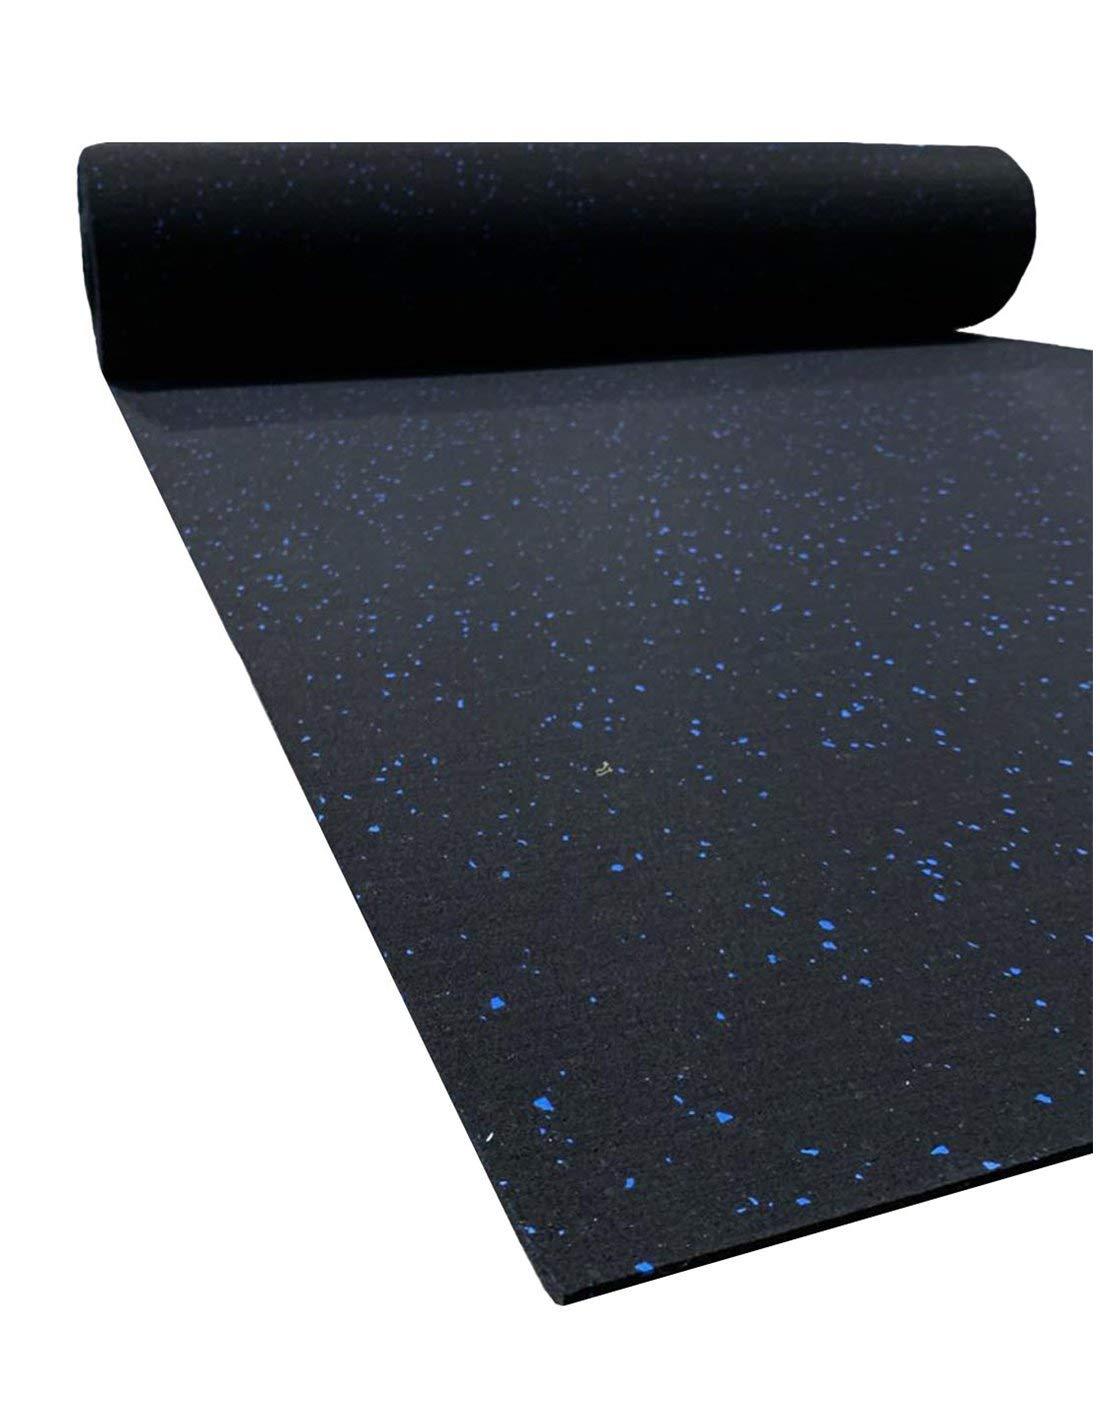 Rollos Jardin202 Rollo 4mm 1,25x15m Suelo para Gimnasio Sport Premium Azul